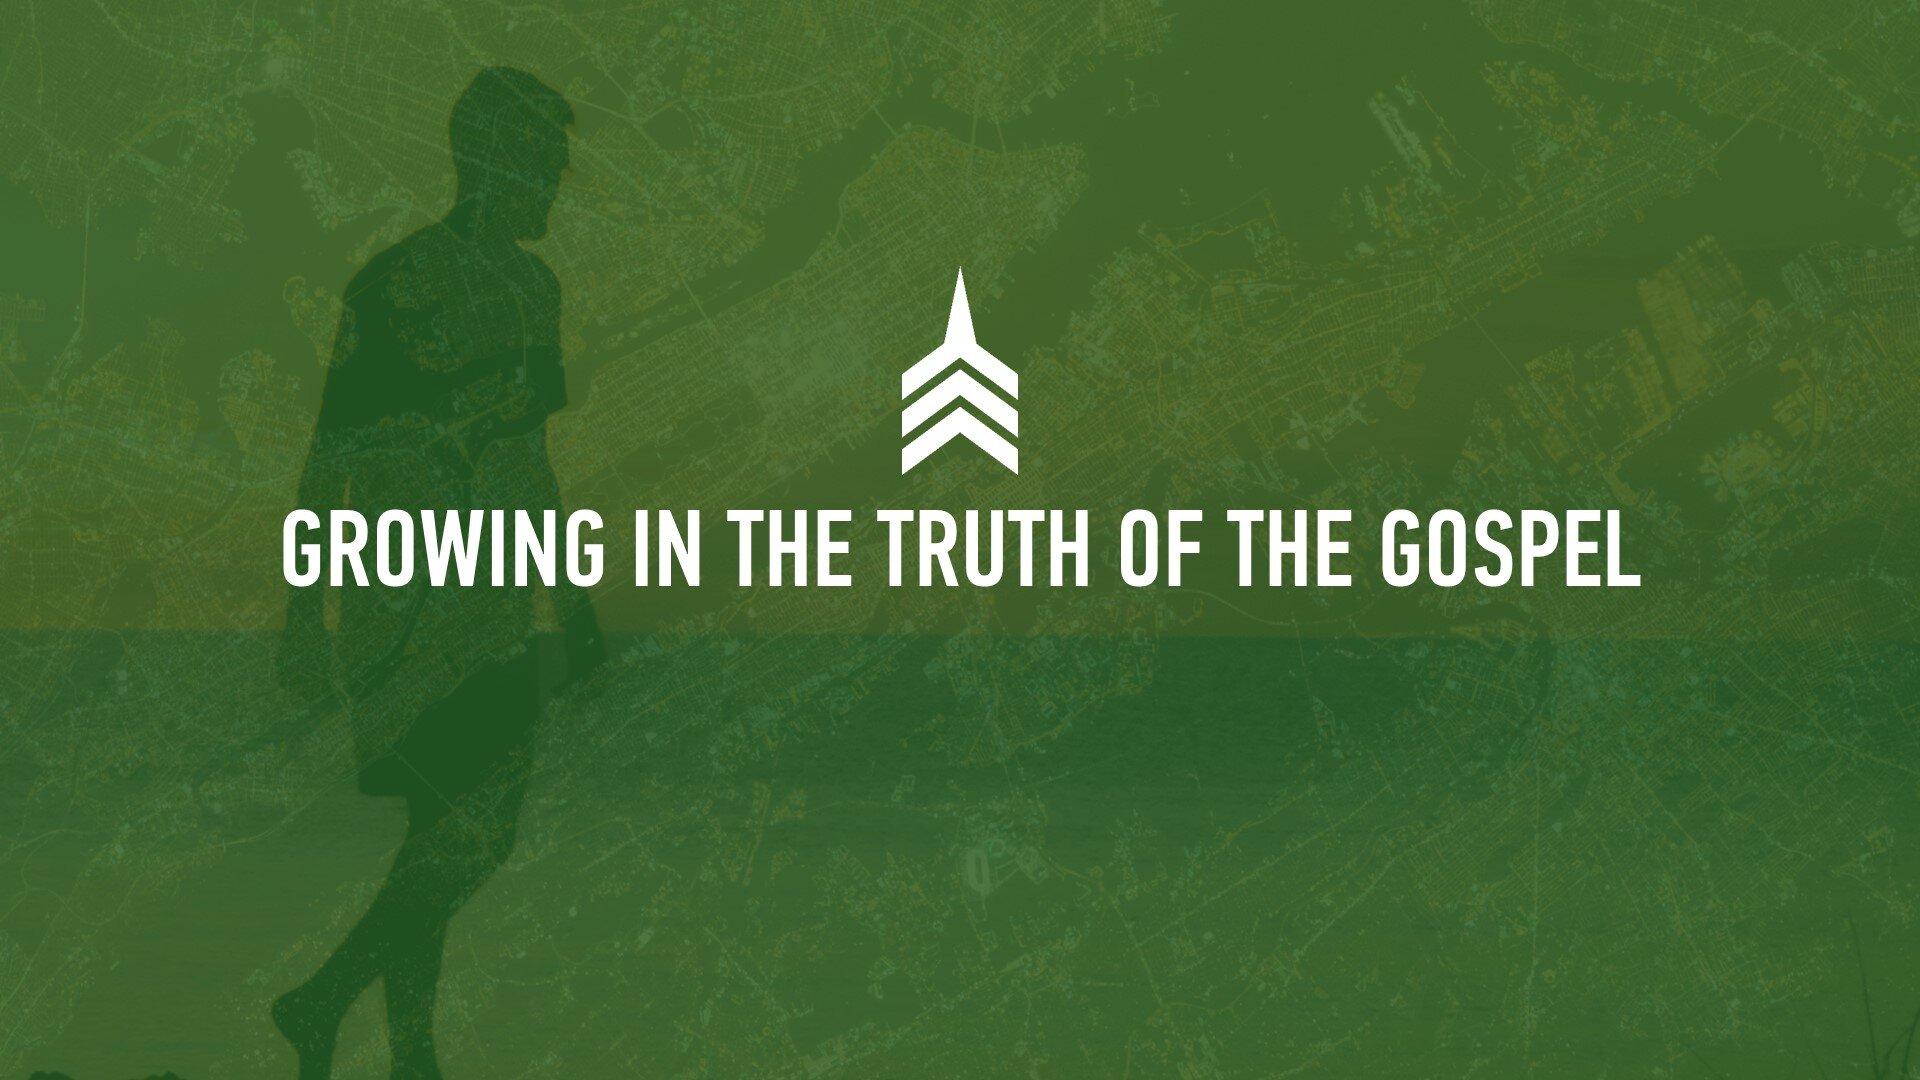 20190922 GROWING IN THE TRUTH OF THE GOSPEL.JPG